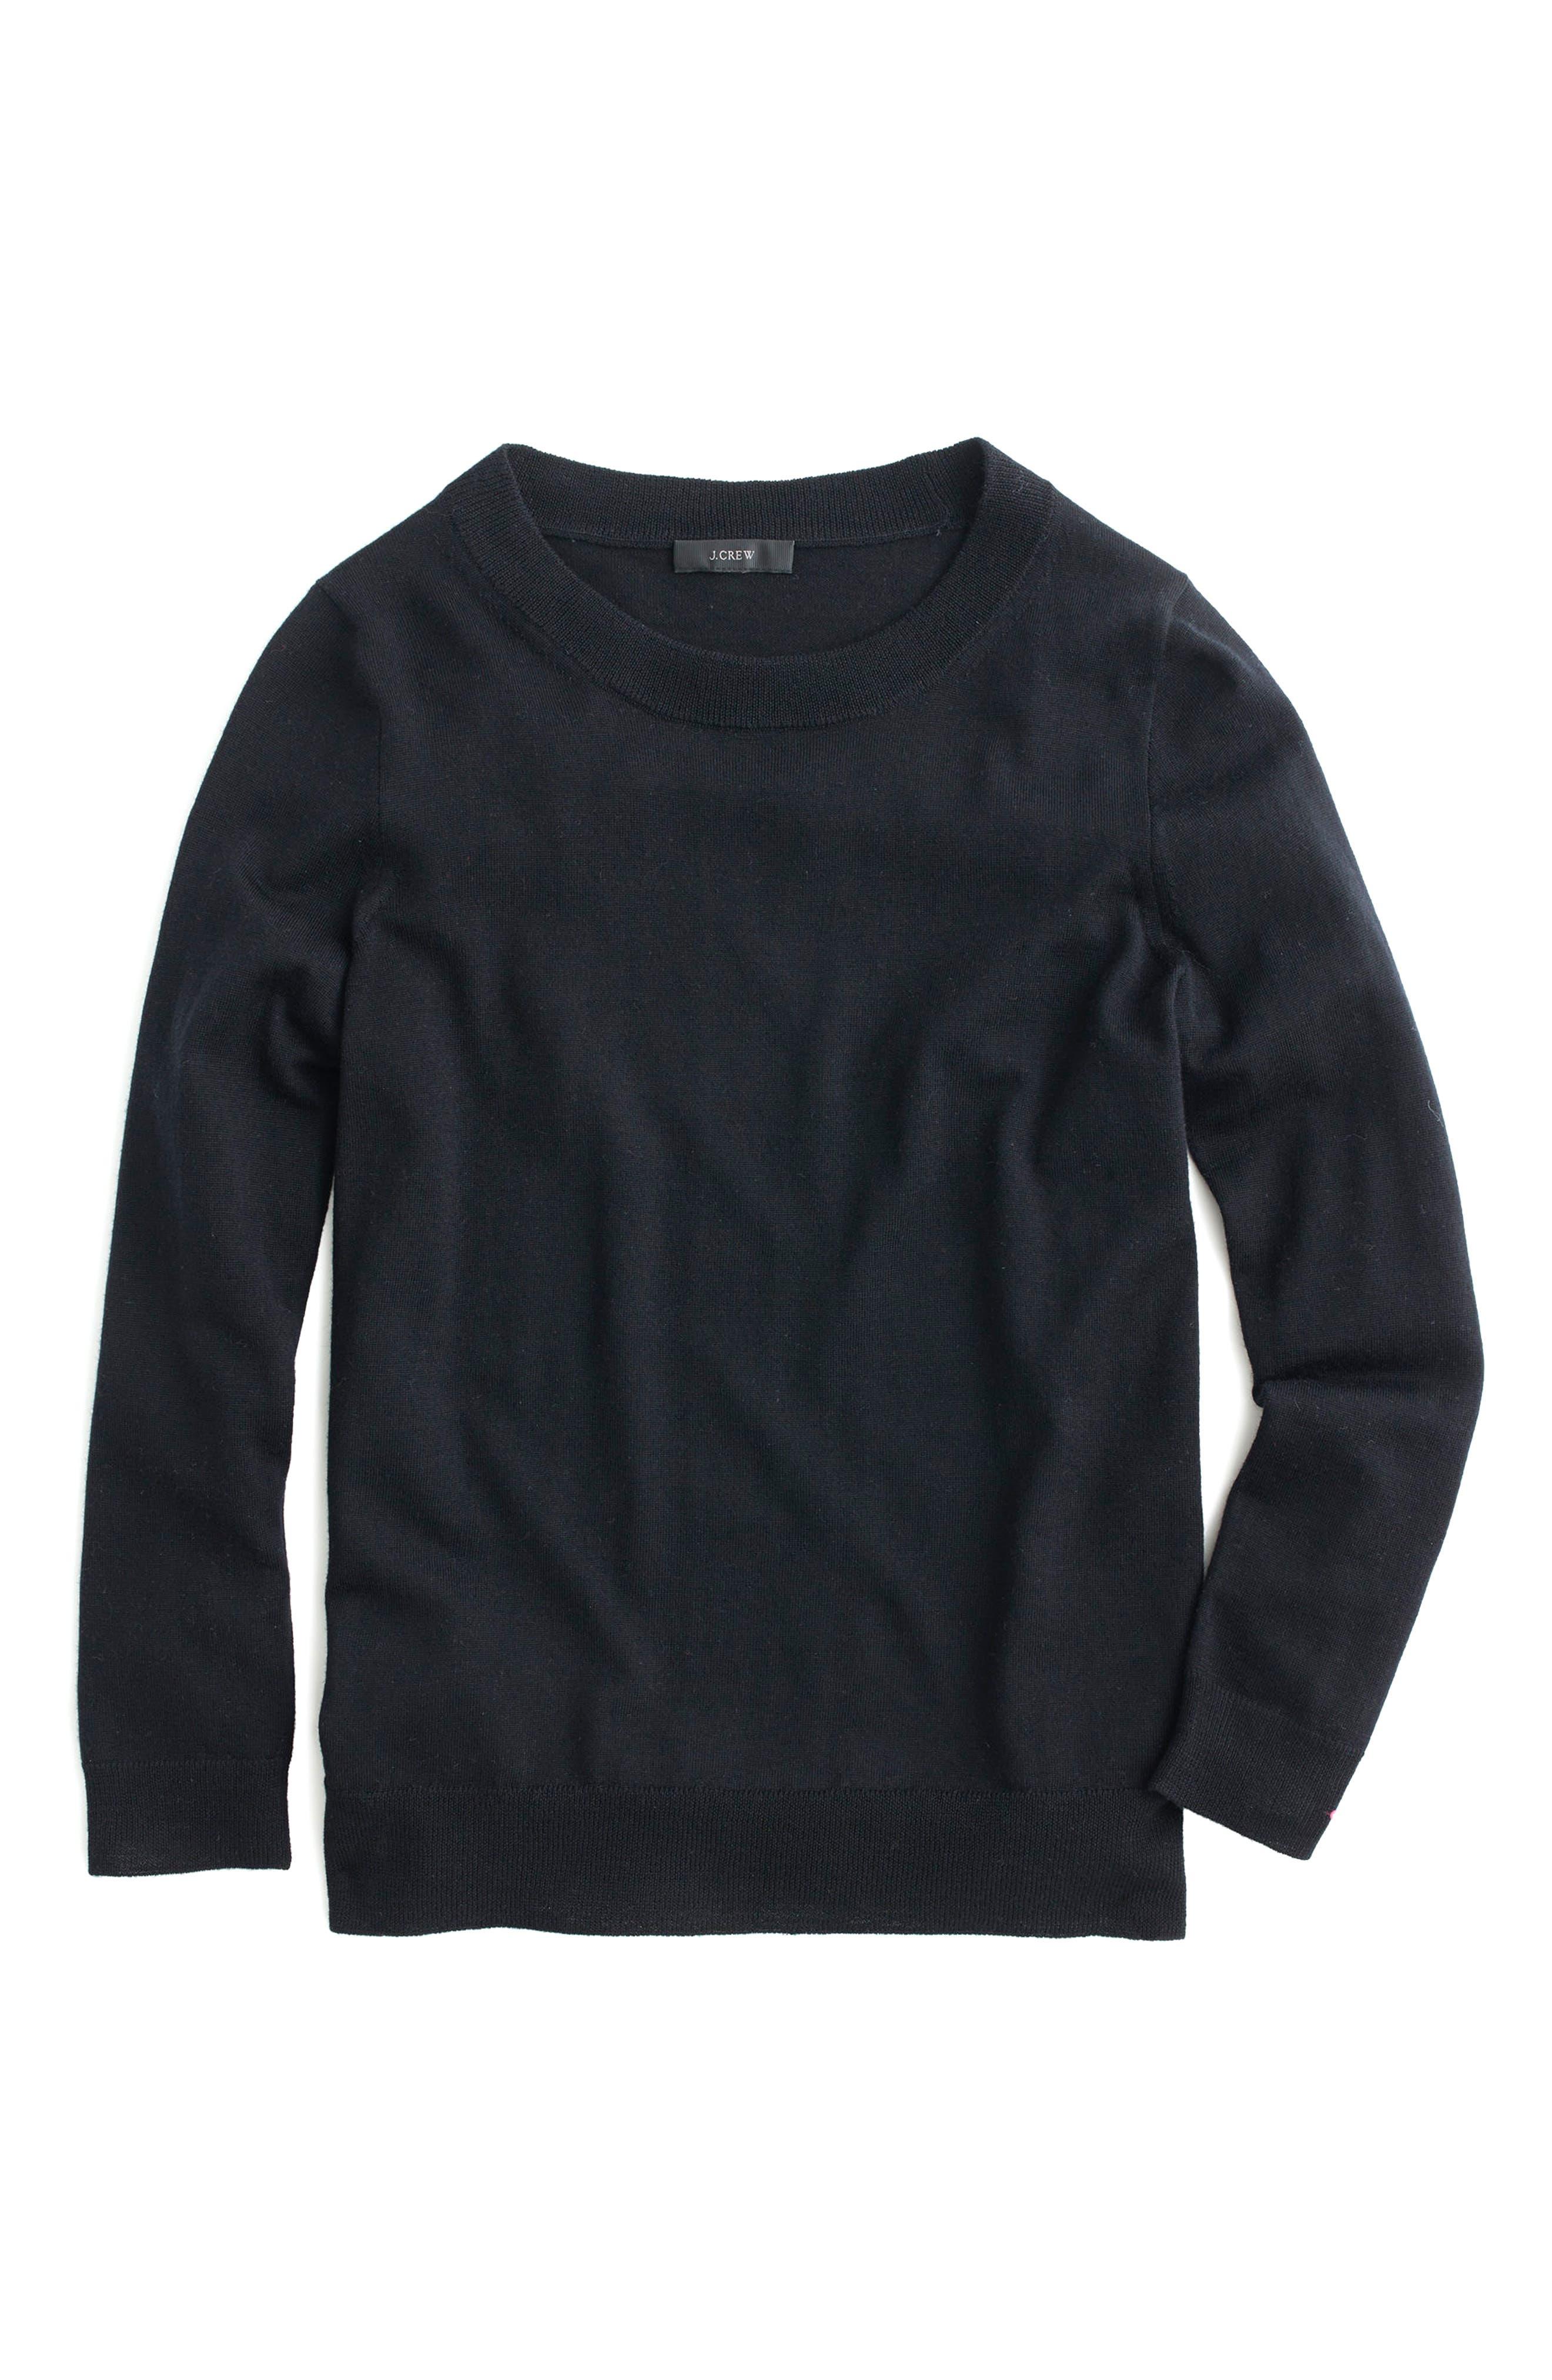 J.crew Tippi Merino Wool Sweater, Black